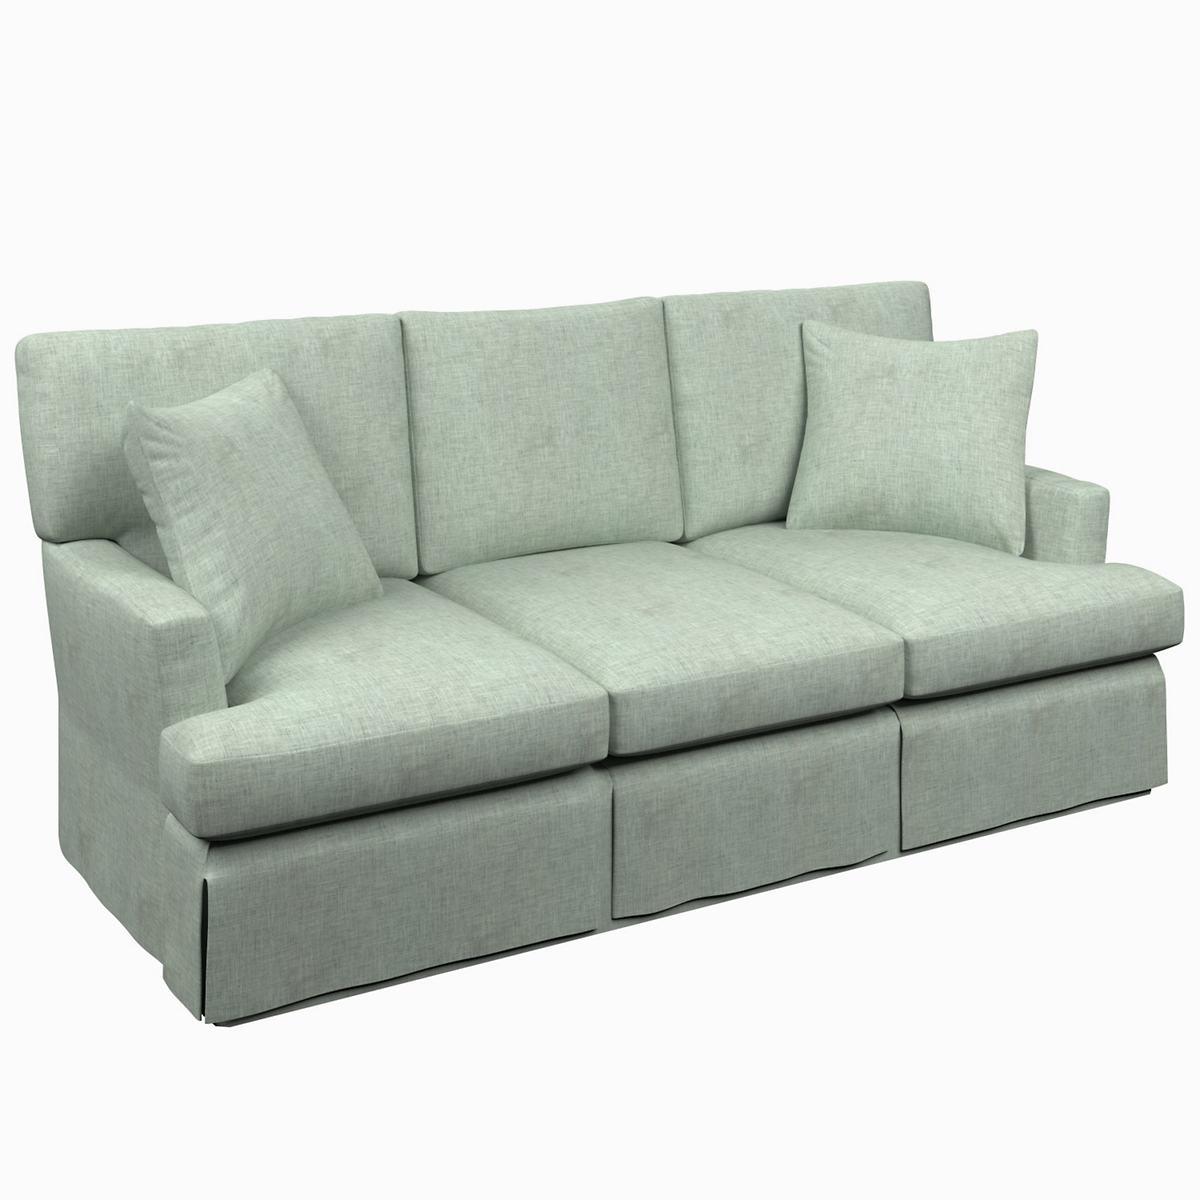 Greylock Light Blue Saybrook 3 Seater Slipcovered Sofa